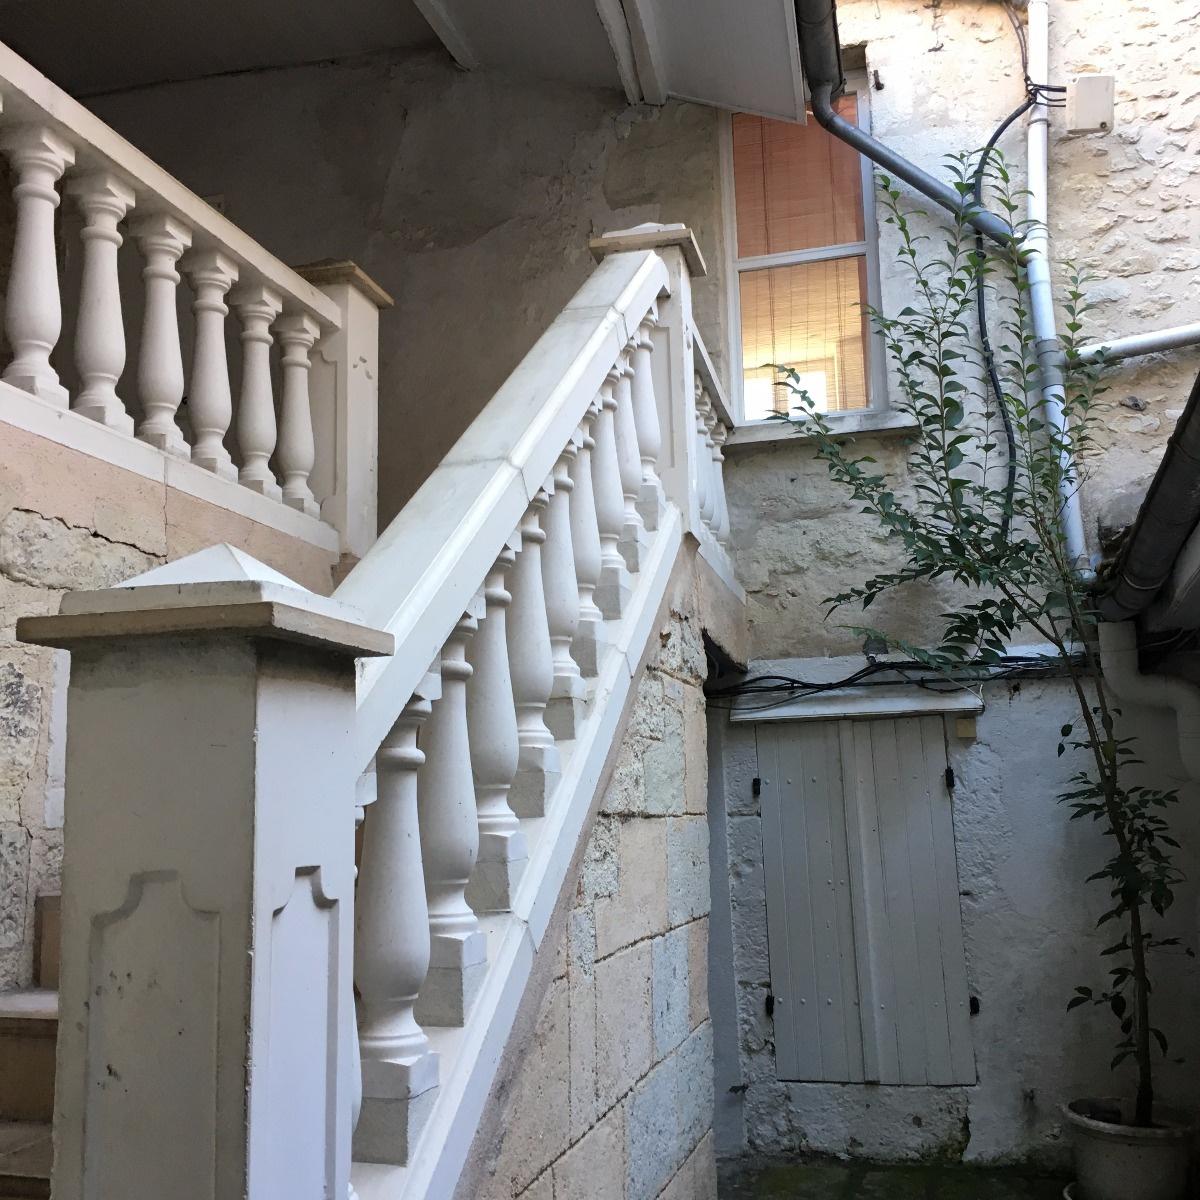 annonce location appartement p rigueux 24000 60 m 530 992739171957. Black Bedroom Furniture Sets. Home Design Ideas